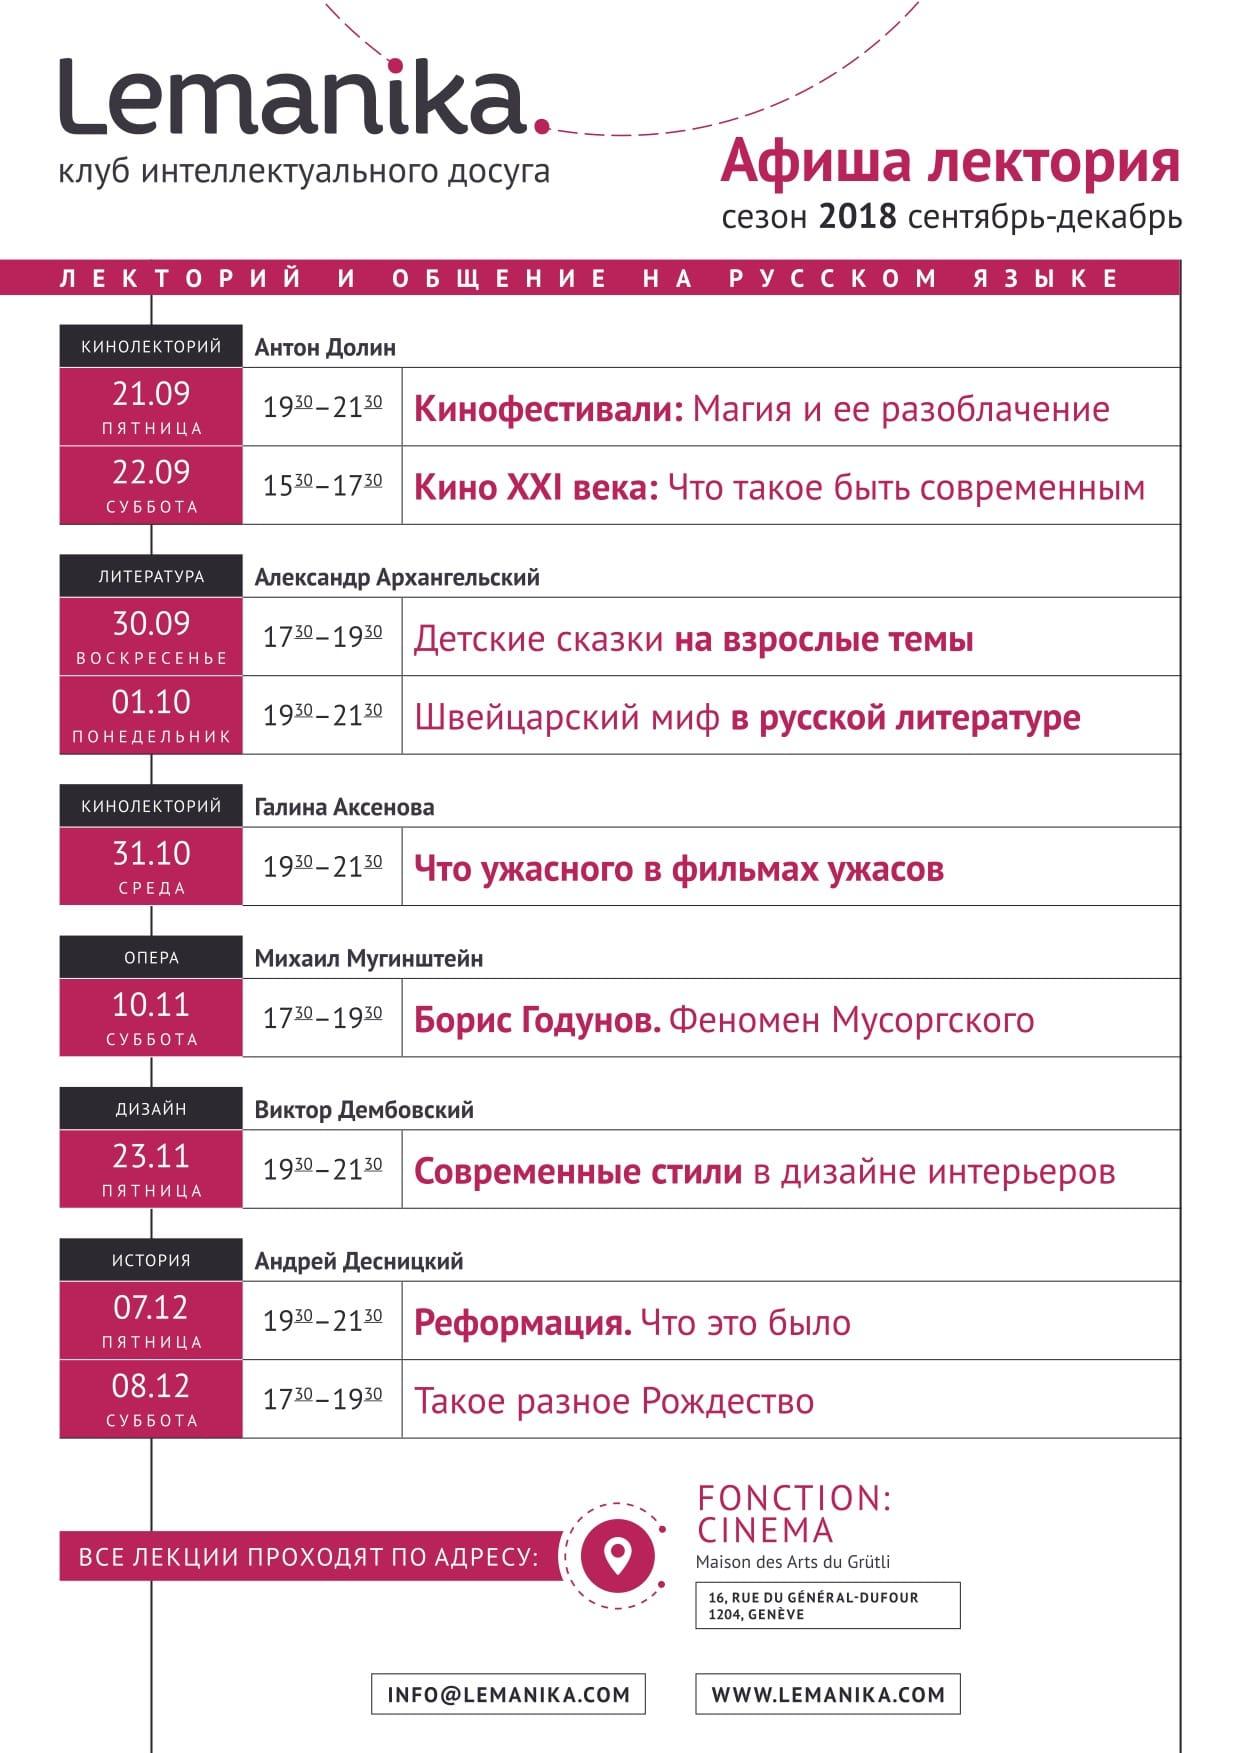 Афиша лектория Lemanika сезон 2018 сентябрь-декабрь